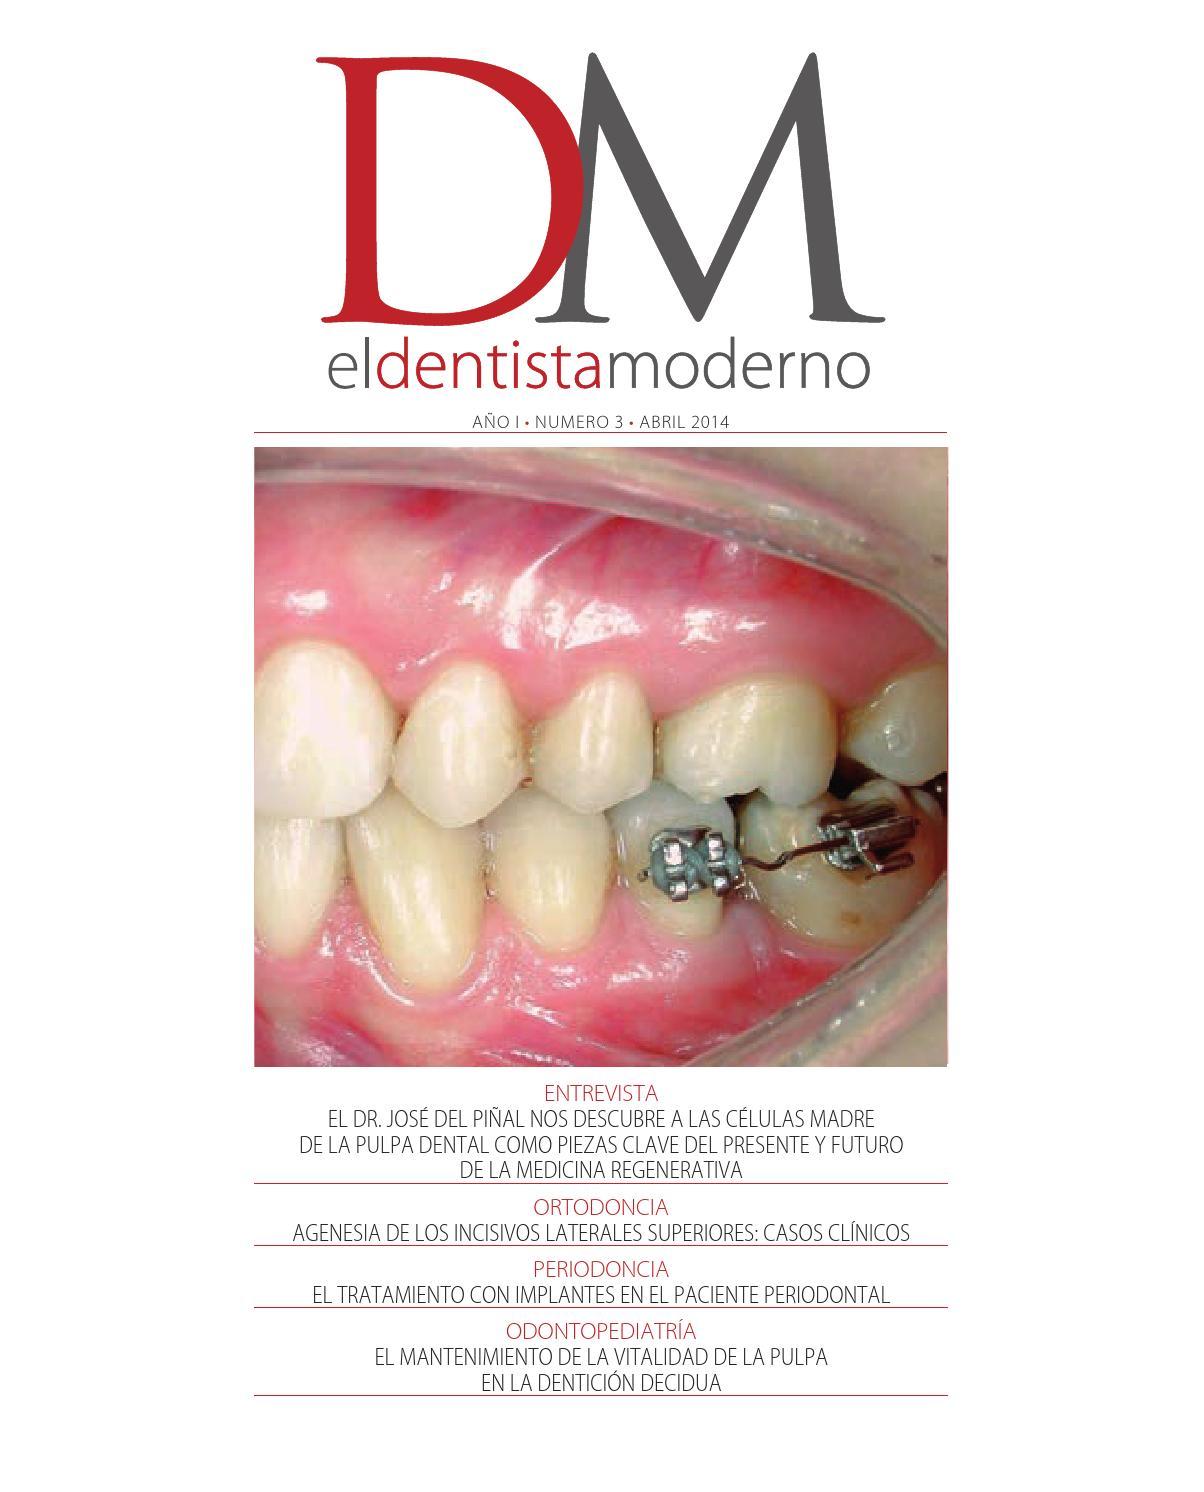 El Dentista Moderno nº 3 by Digital Newspapers S.L. - issuu